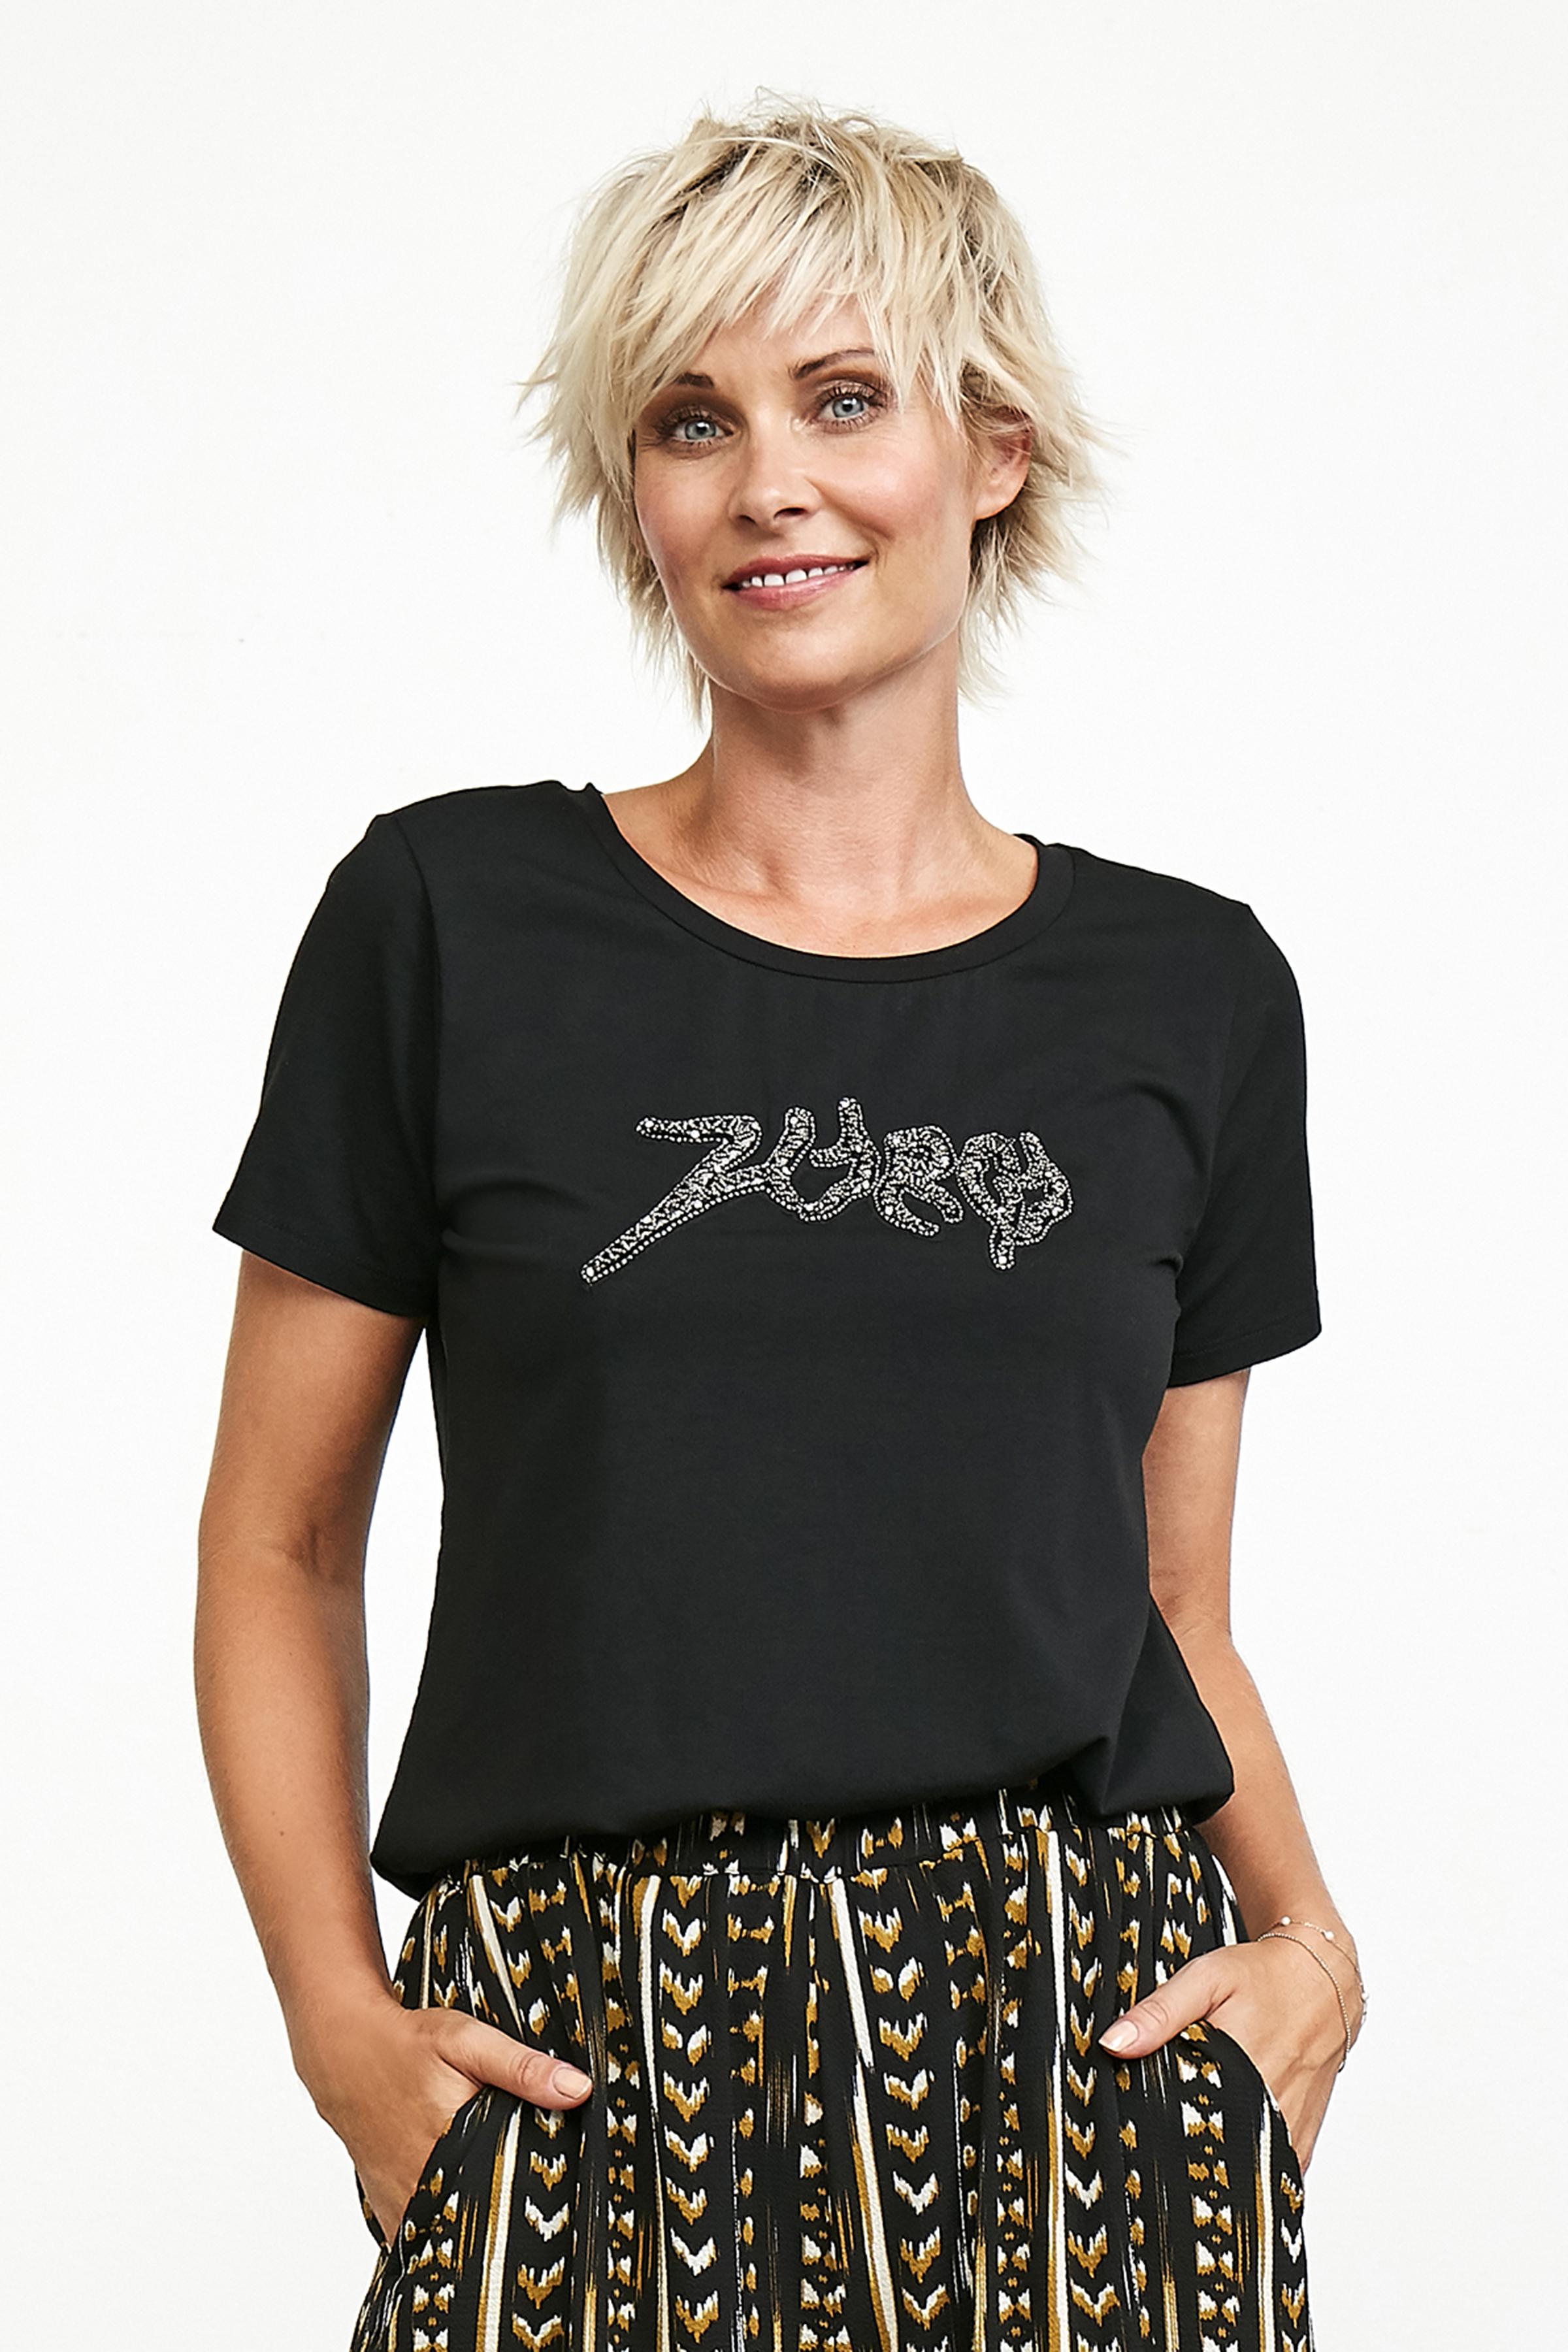 Schwarz Kurzarm T-Shirt von Culture – Shoppen Sie Schwarz Kurzarm T-Shirt ab Gr. XS-XXL hier